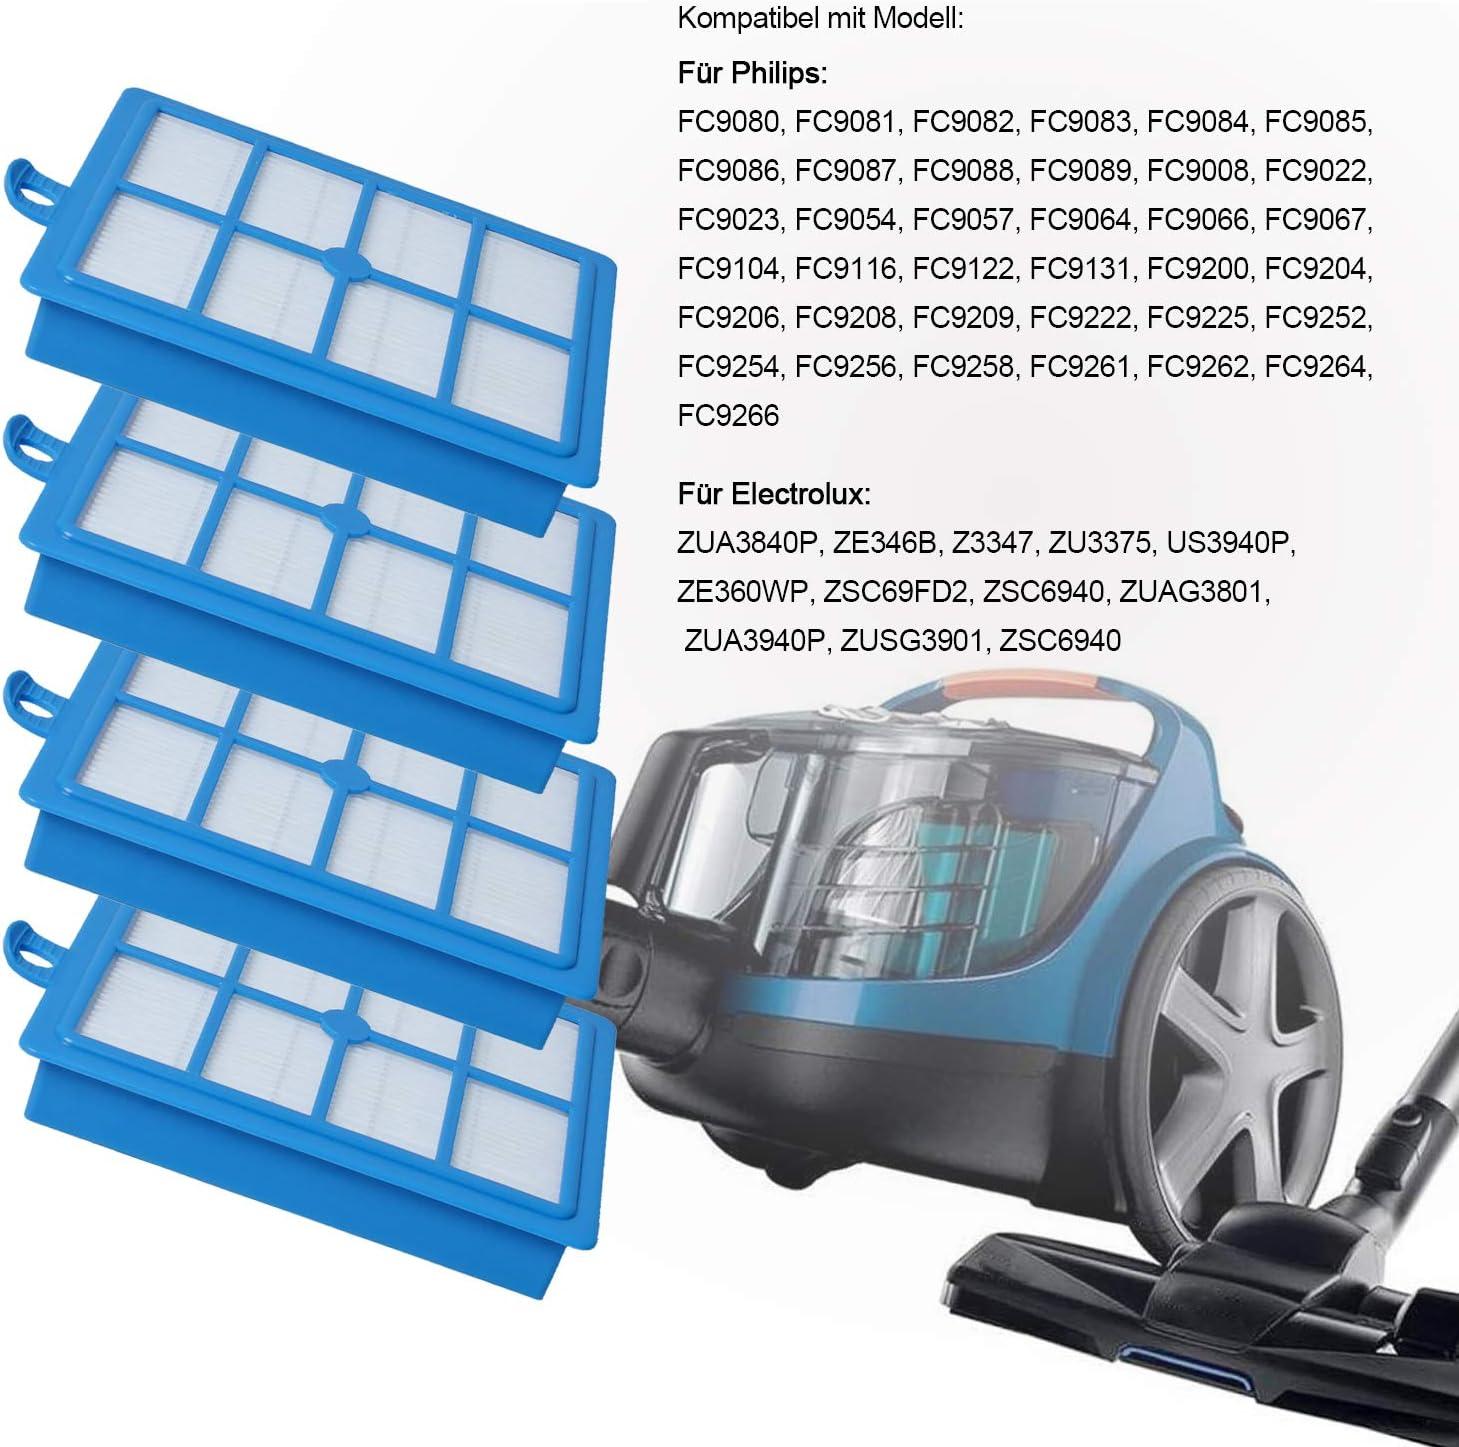 Poweka HEPA13 - Filtro para aspiradora Philips FC8038/01 AEG/Electrolux/Tornado/Volta (4 unidades): Amazon.es: Hogar